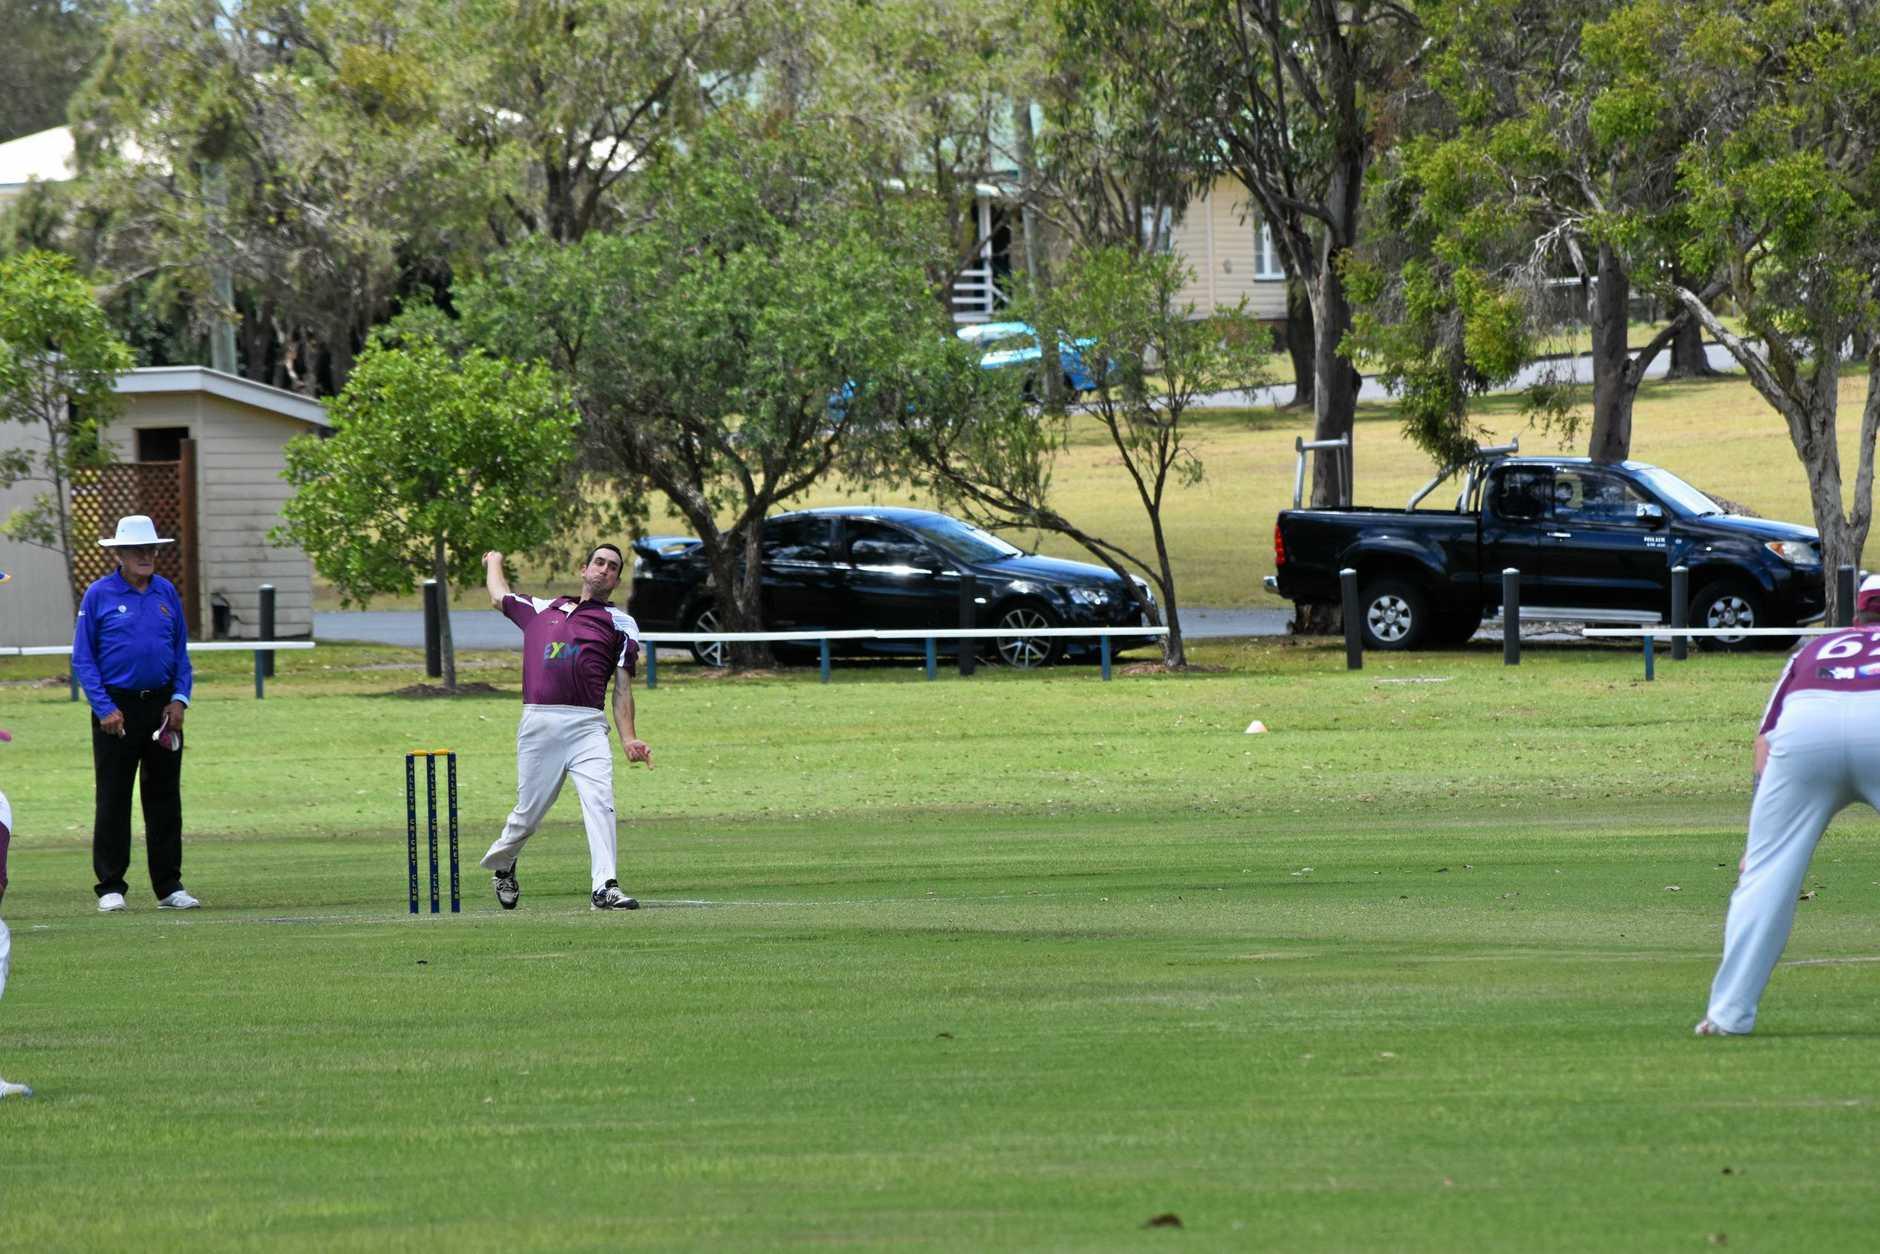 Gympie regional cricket association Valleys v Colts - Colts bowler Anthoney Smerdon.